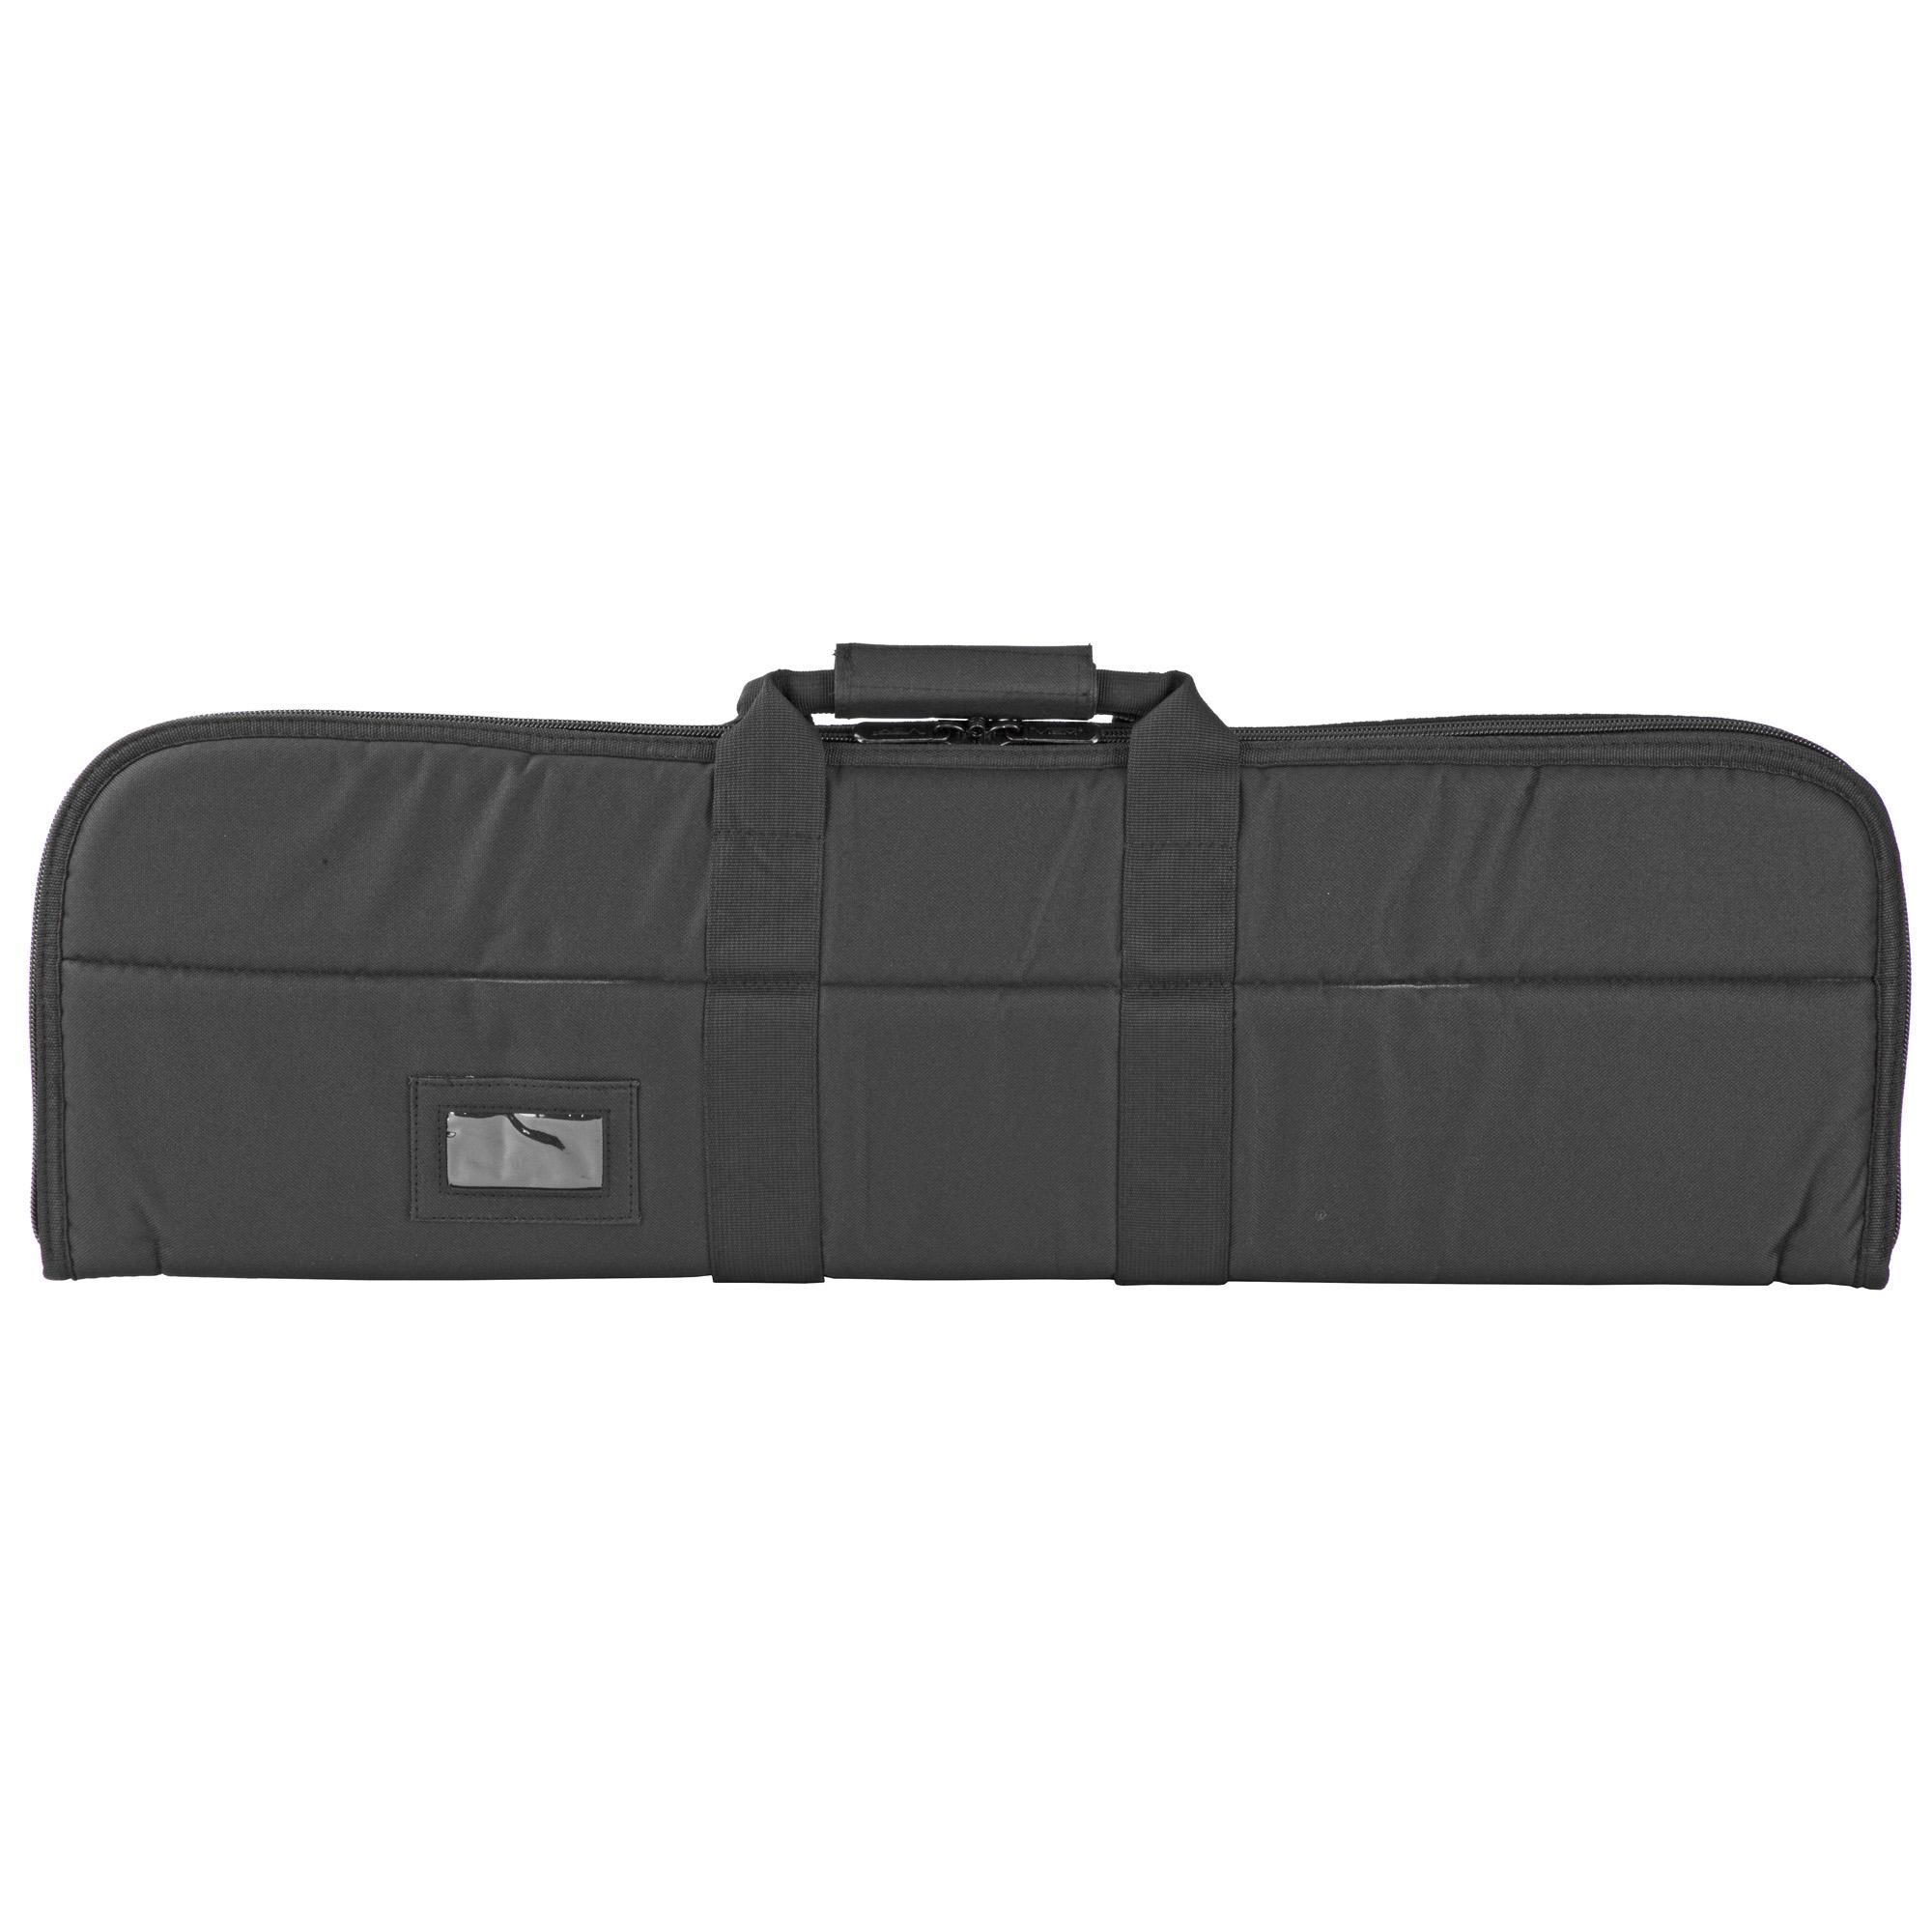 NCSTAR Rifle Case Nylon 32″ – Black